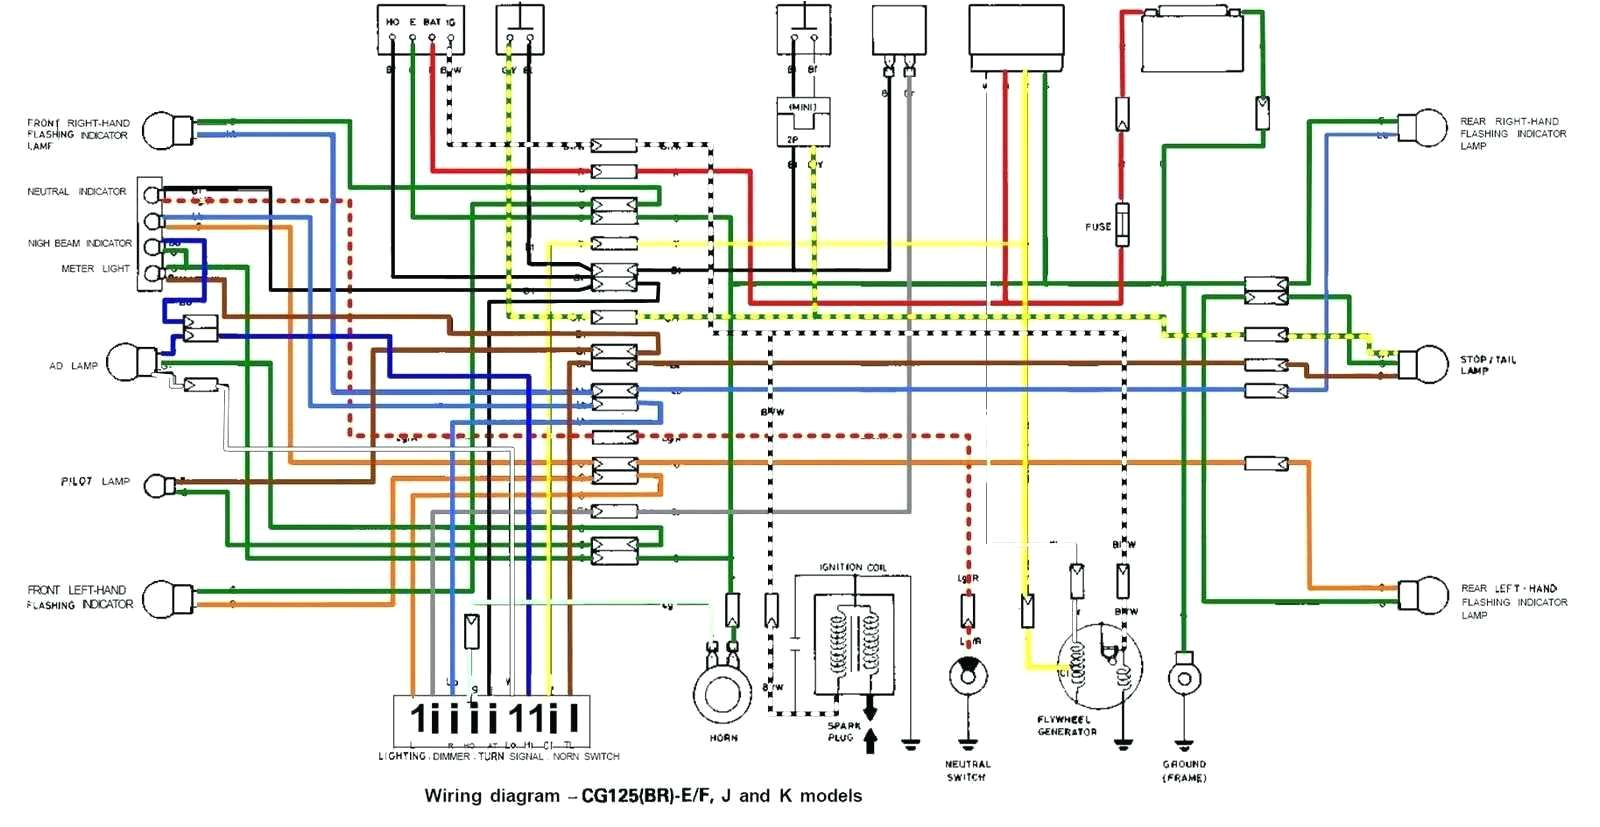 honda xrm 125 wiring diagram photography cheat sheets honda bycke diagram honda